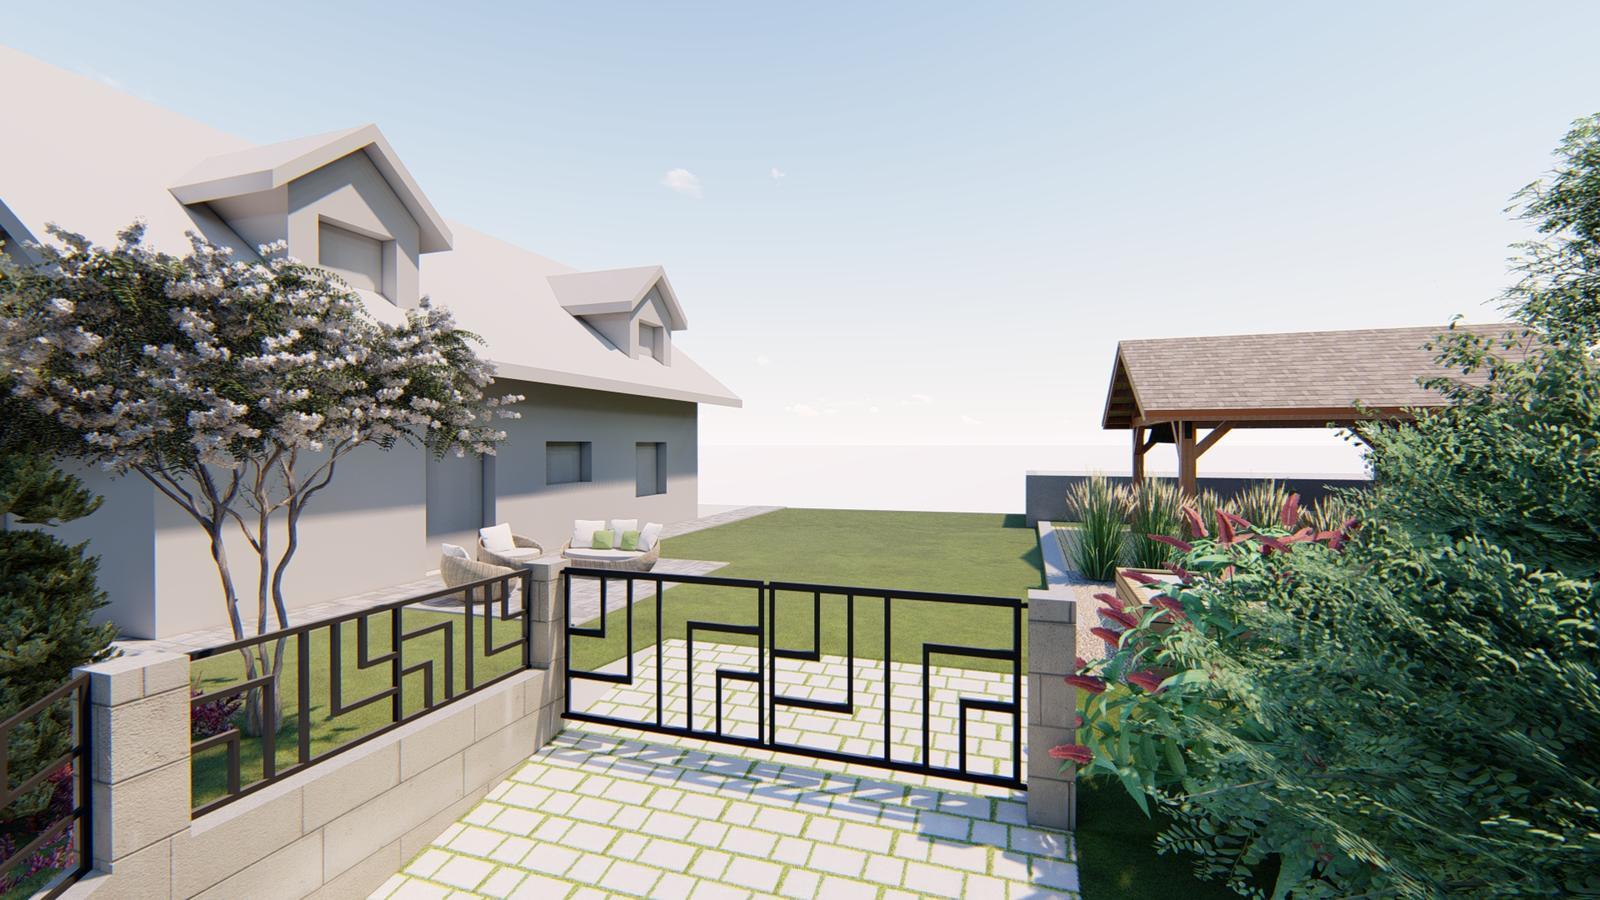 Návrh záhrady rodinného domu - Obrázok č. 3